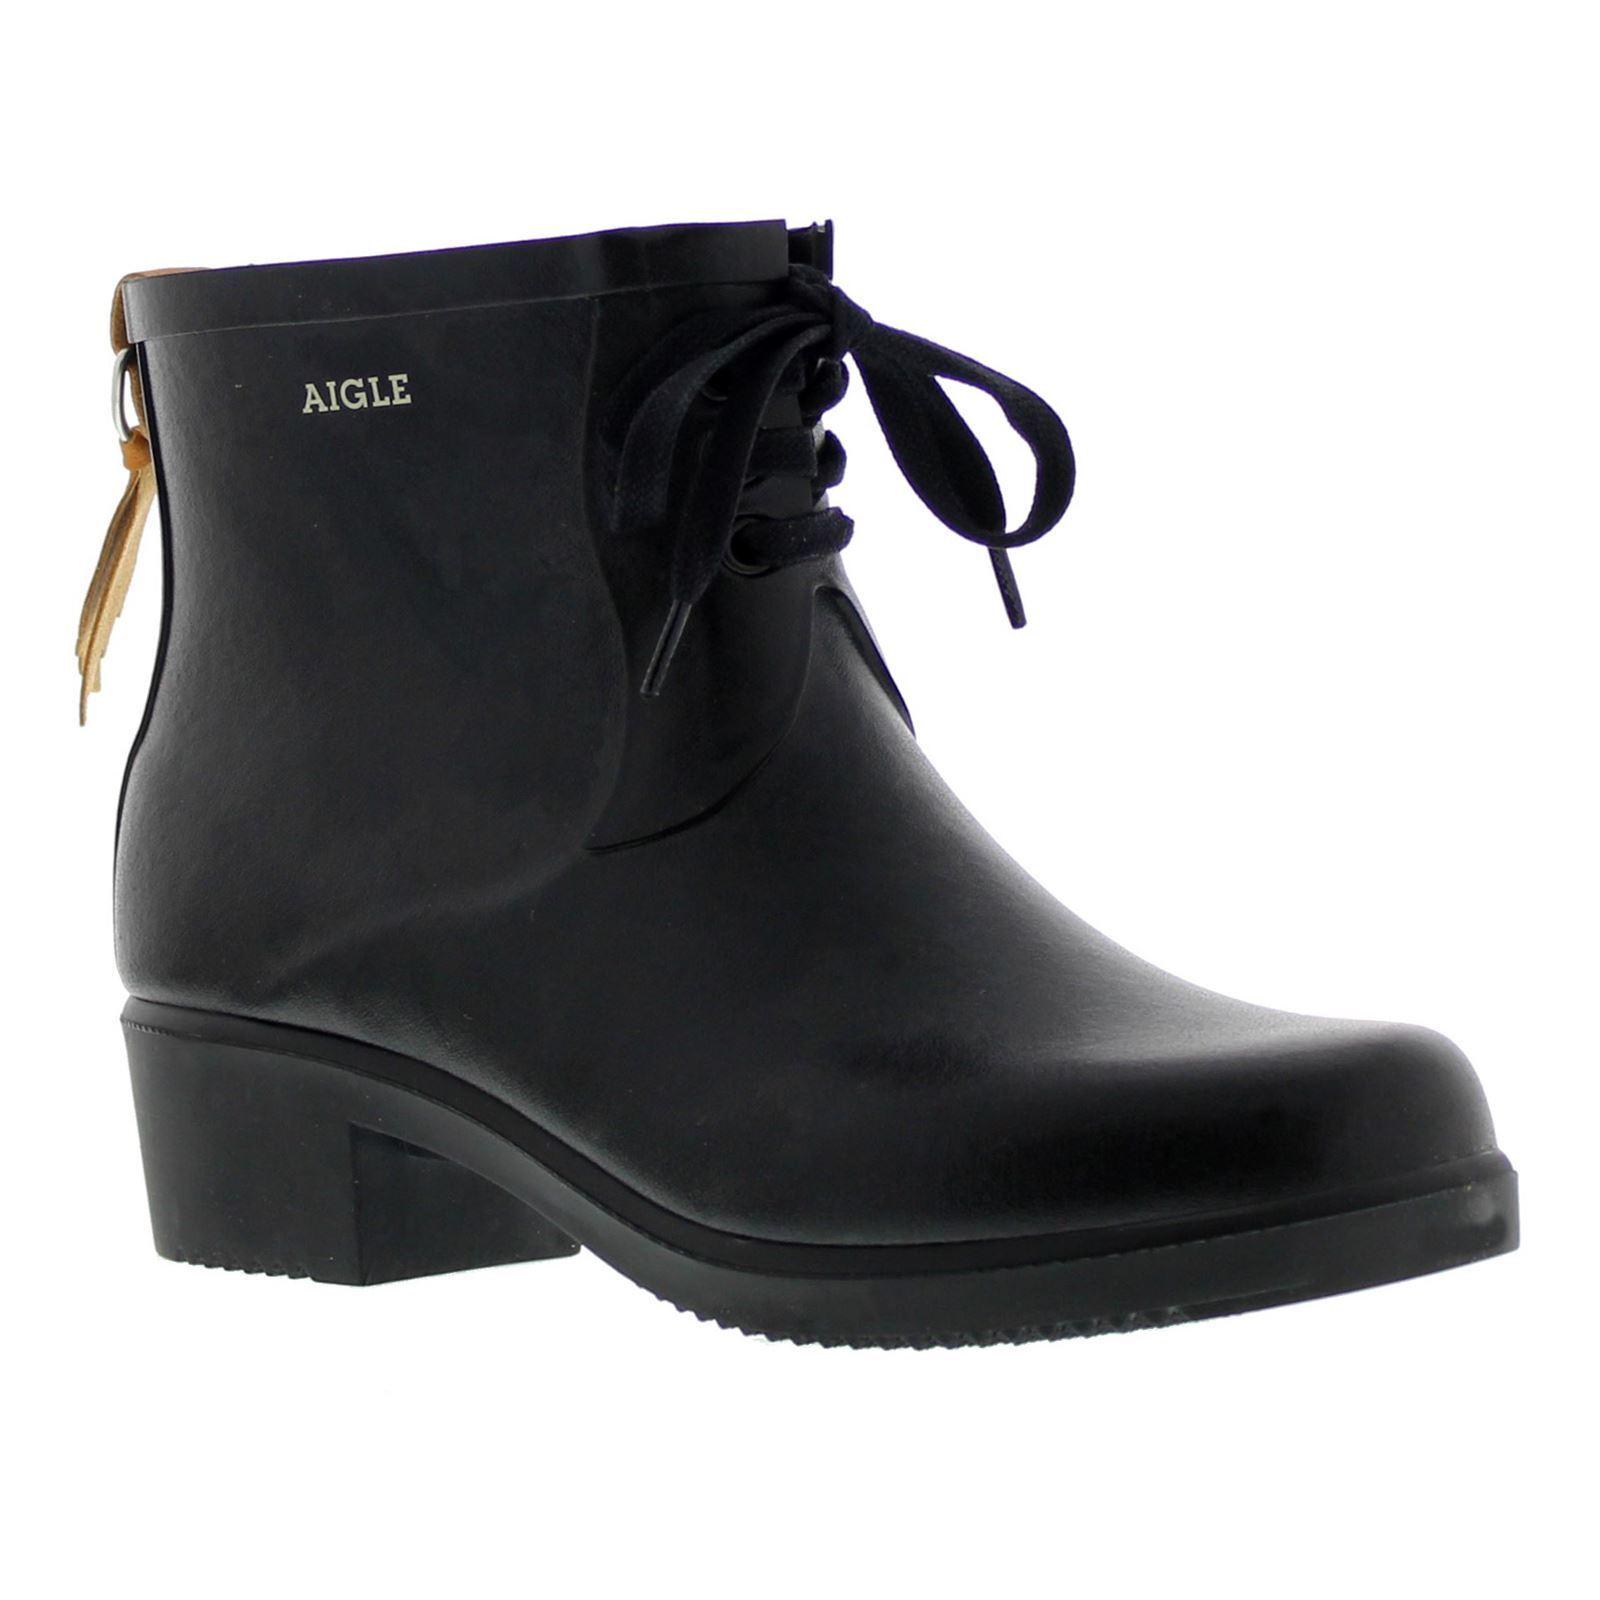 Aigle Miss Juliette bottillon Encaje Negro Para mujeres botas botas botas al Tobillo botas De Agua Goma